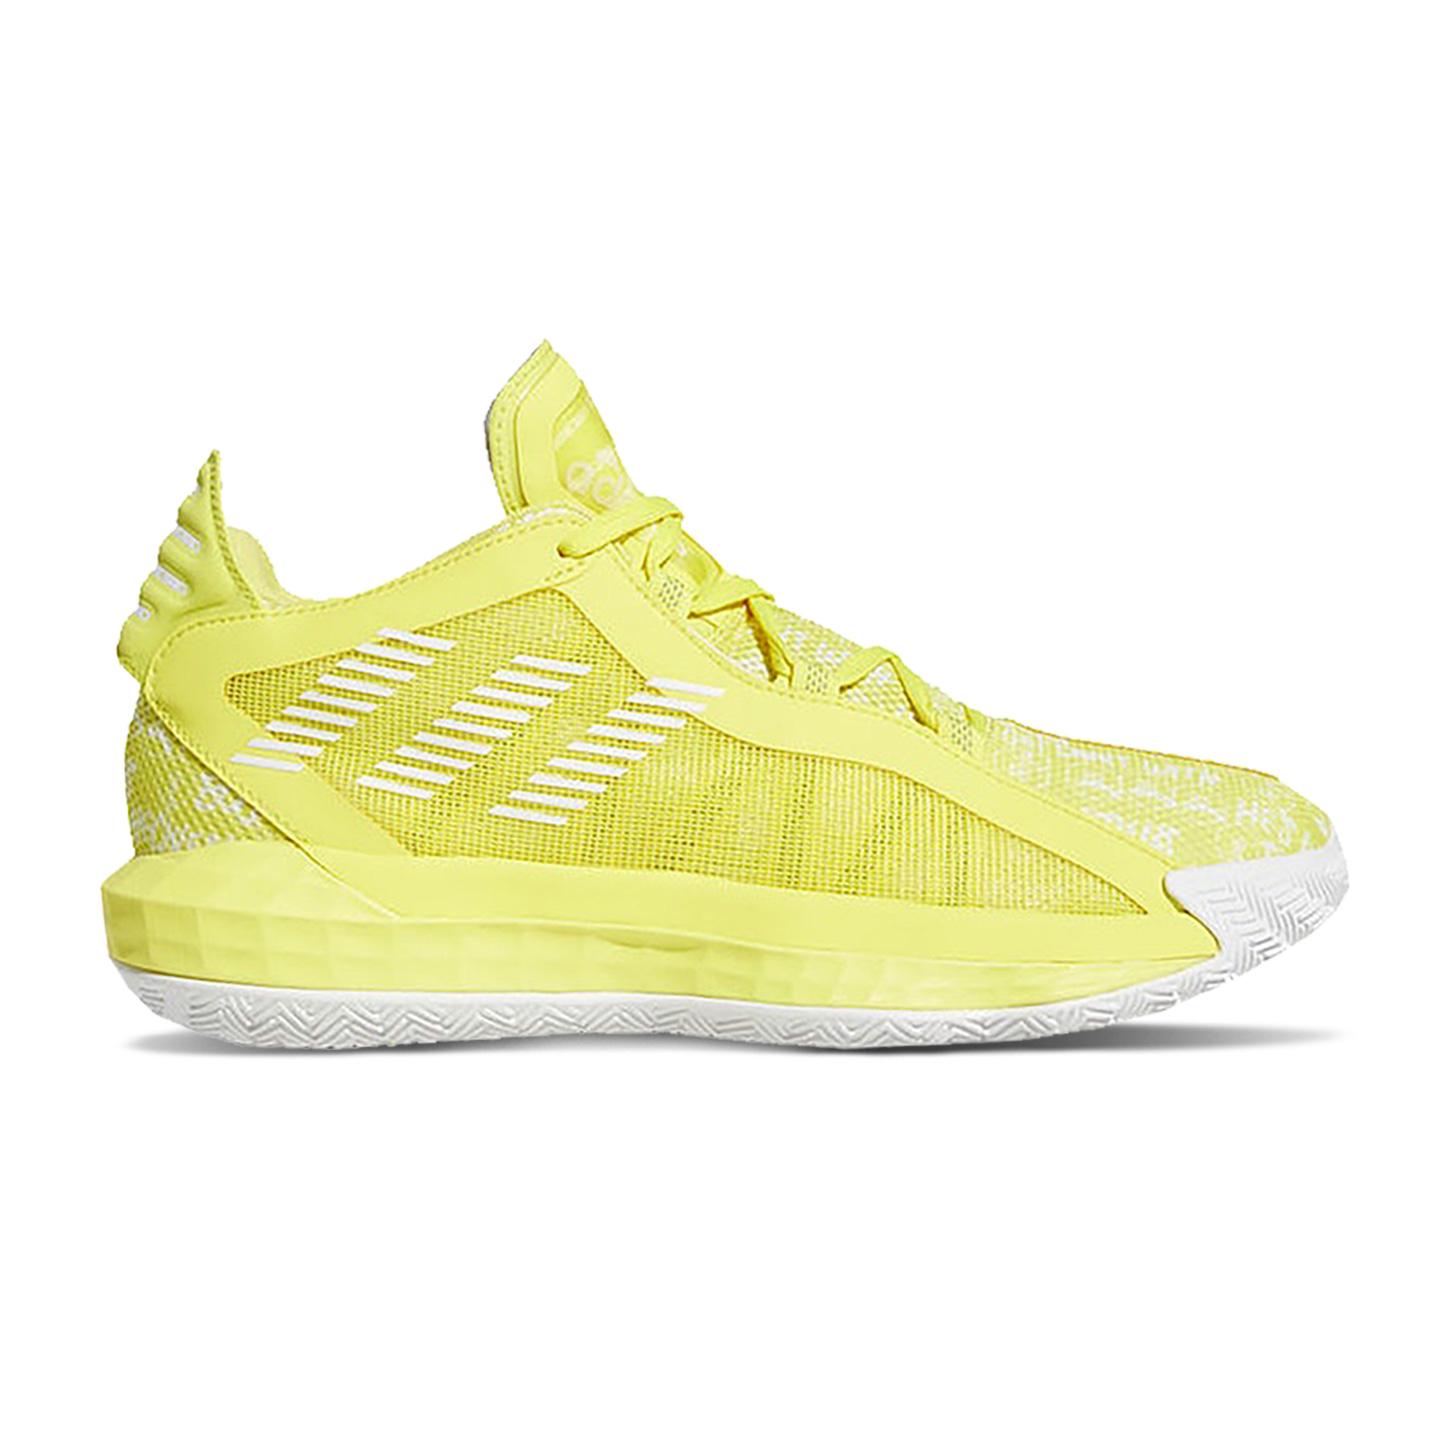 Dame-6-Shock-Yellow-White